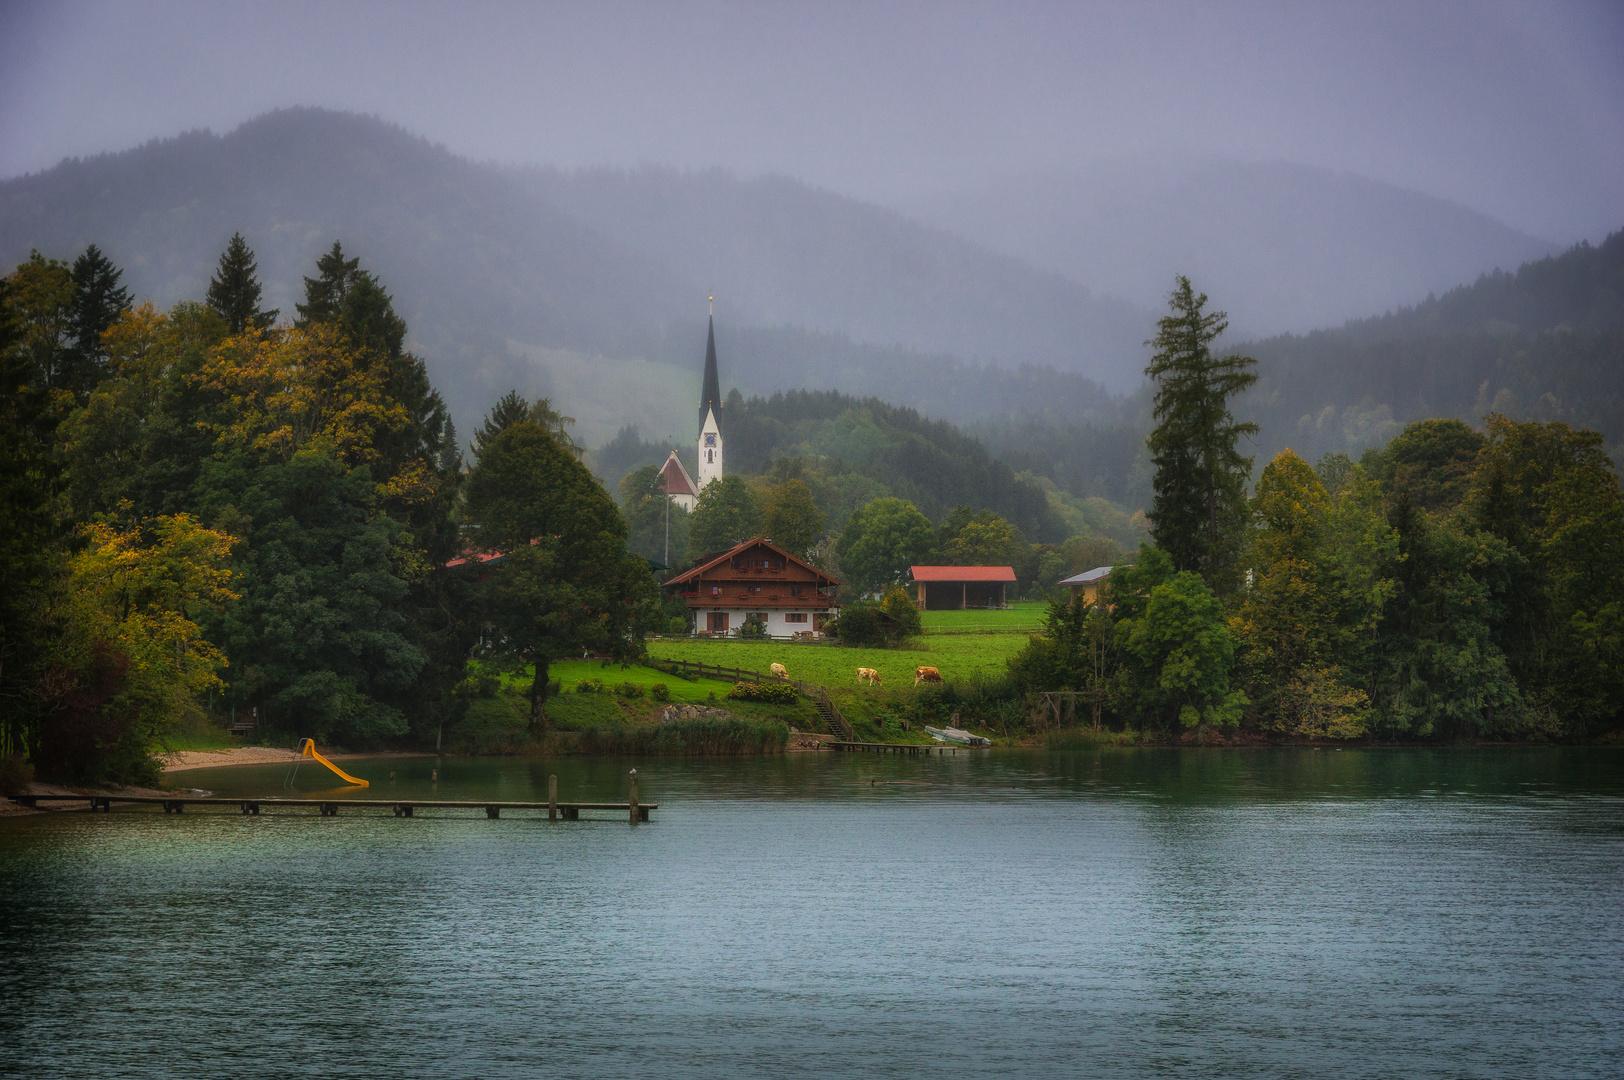 ....Besuch am Tegernsee...